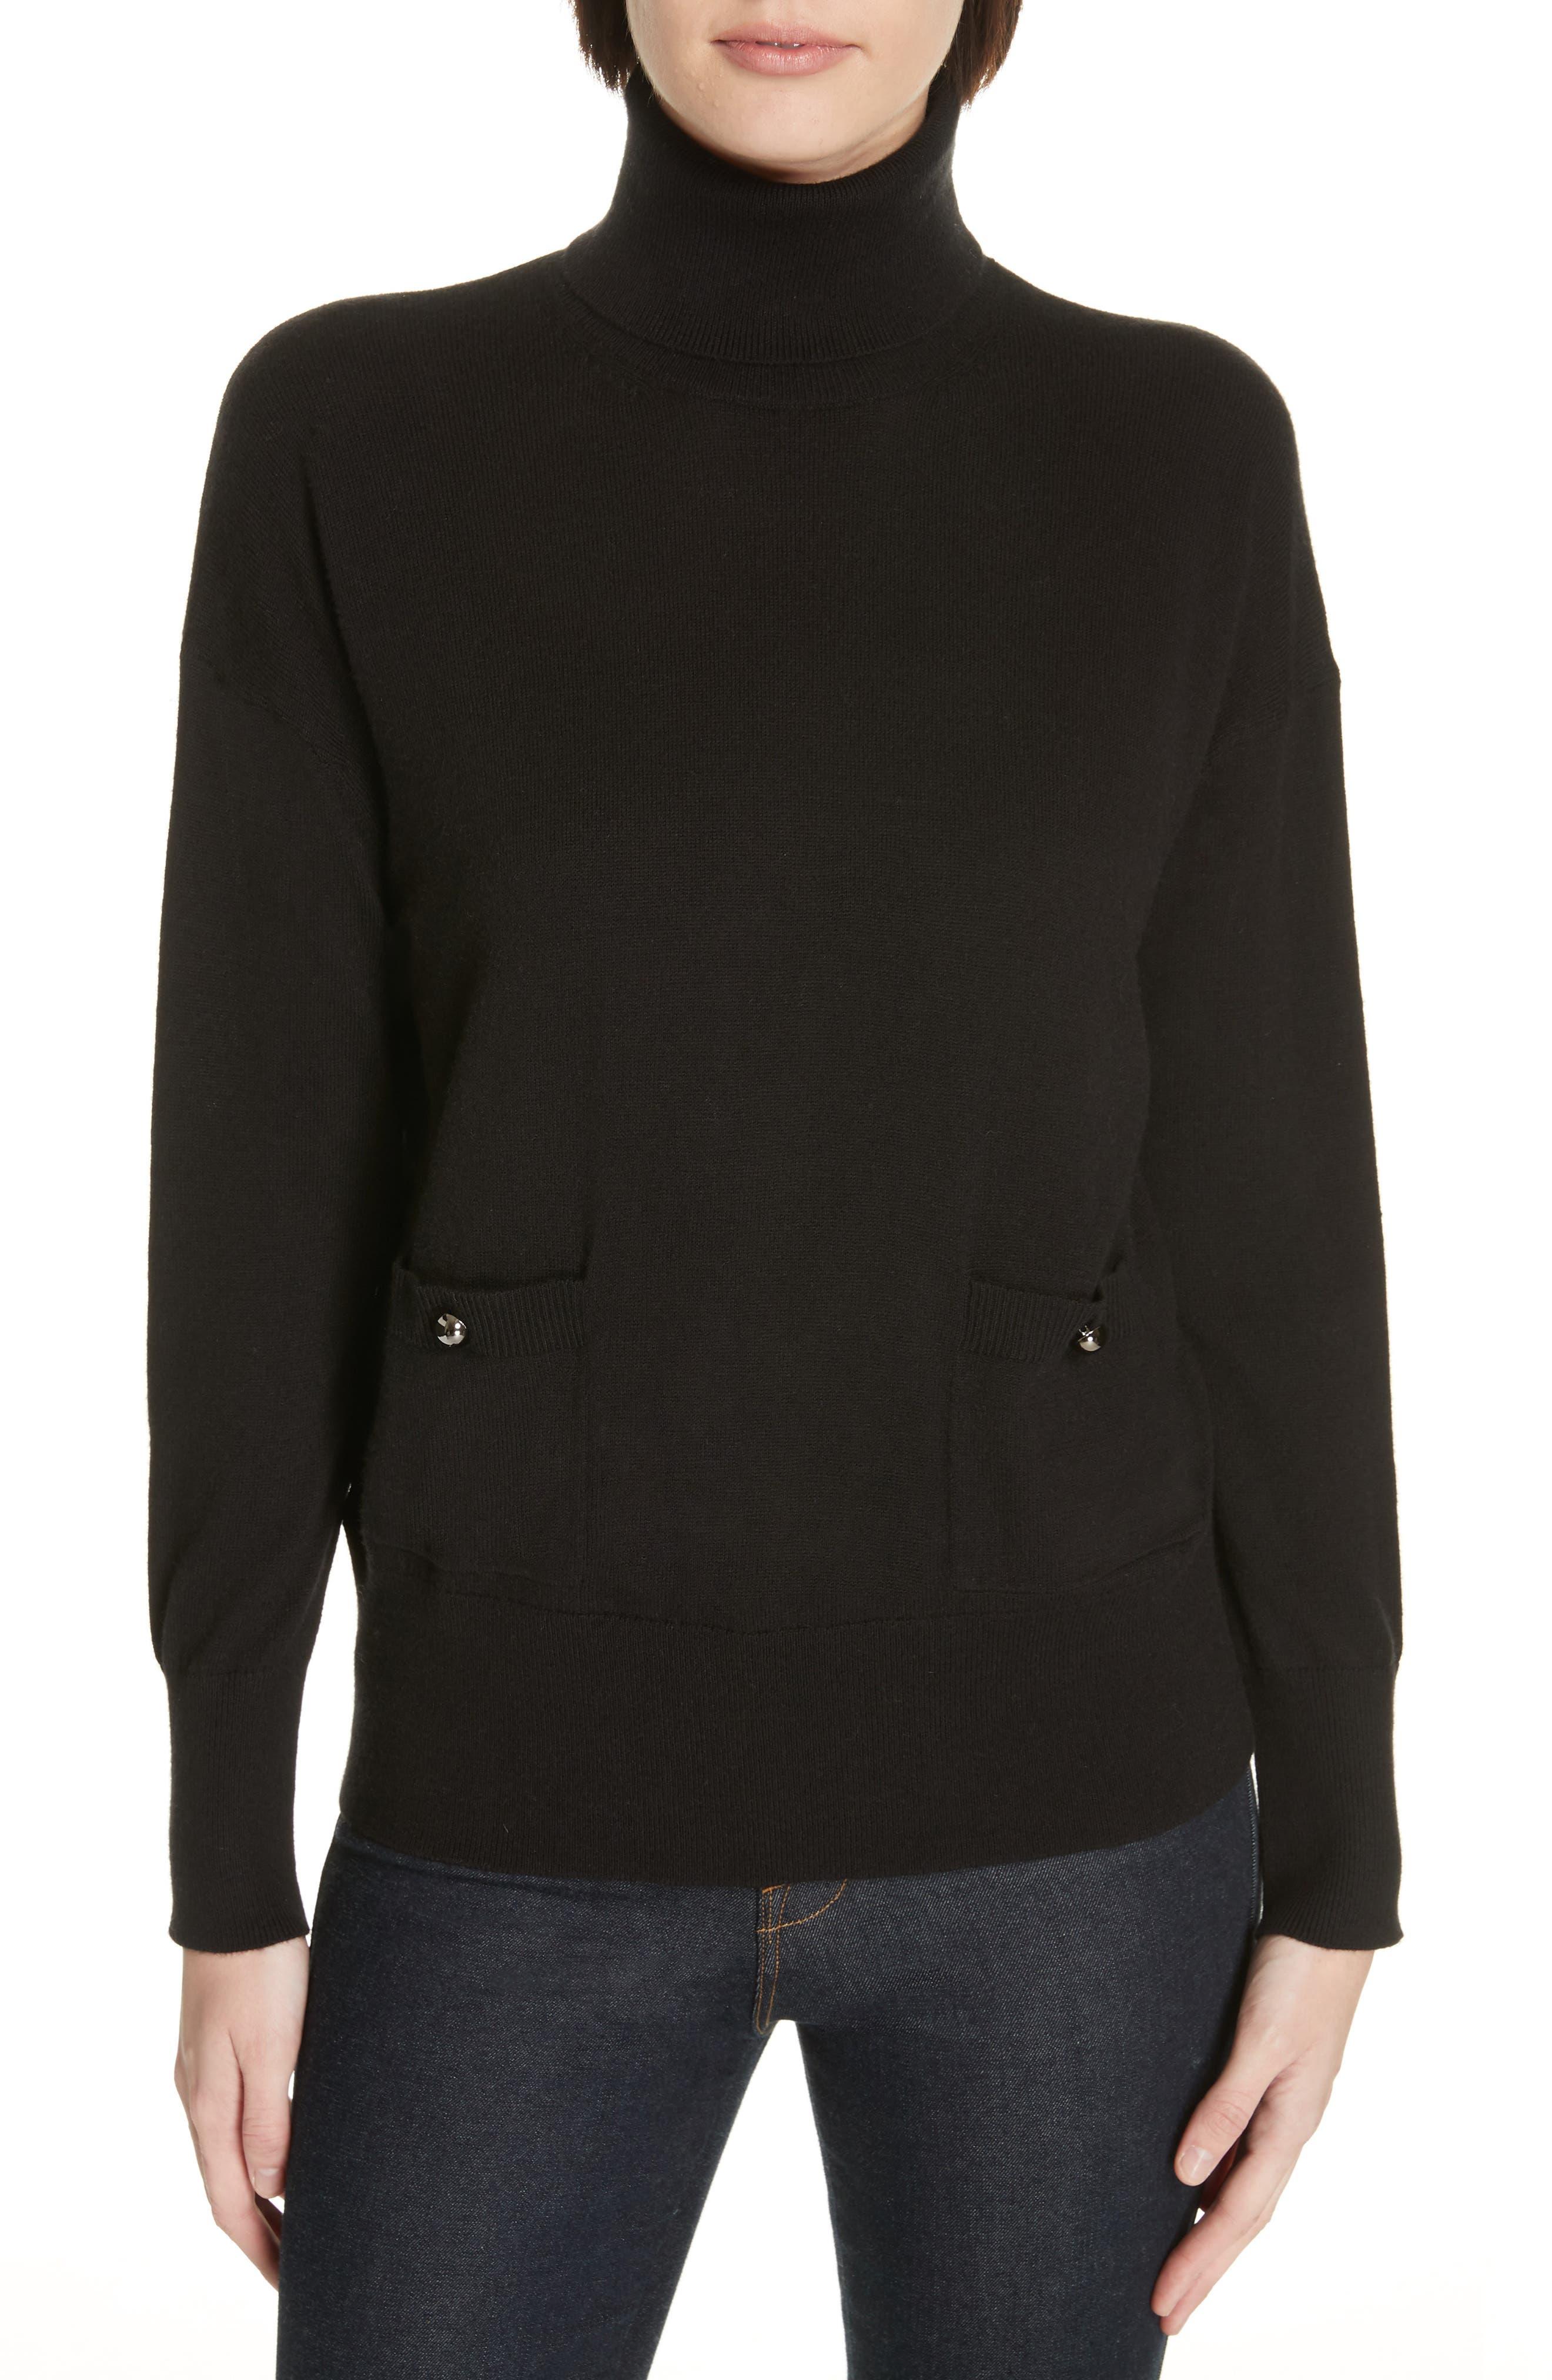 Broome Street Wool-Blend Turtleneck Sweater in Black